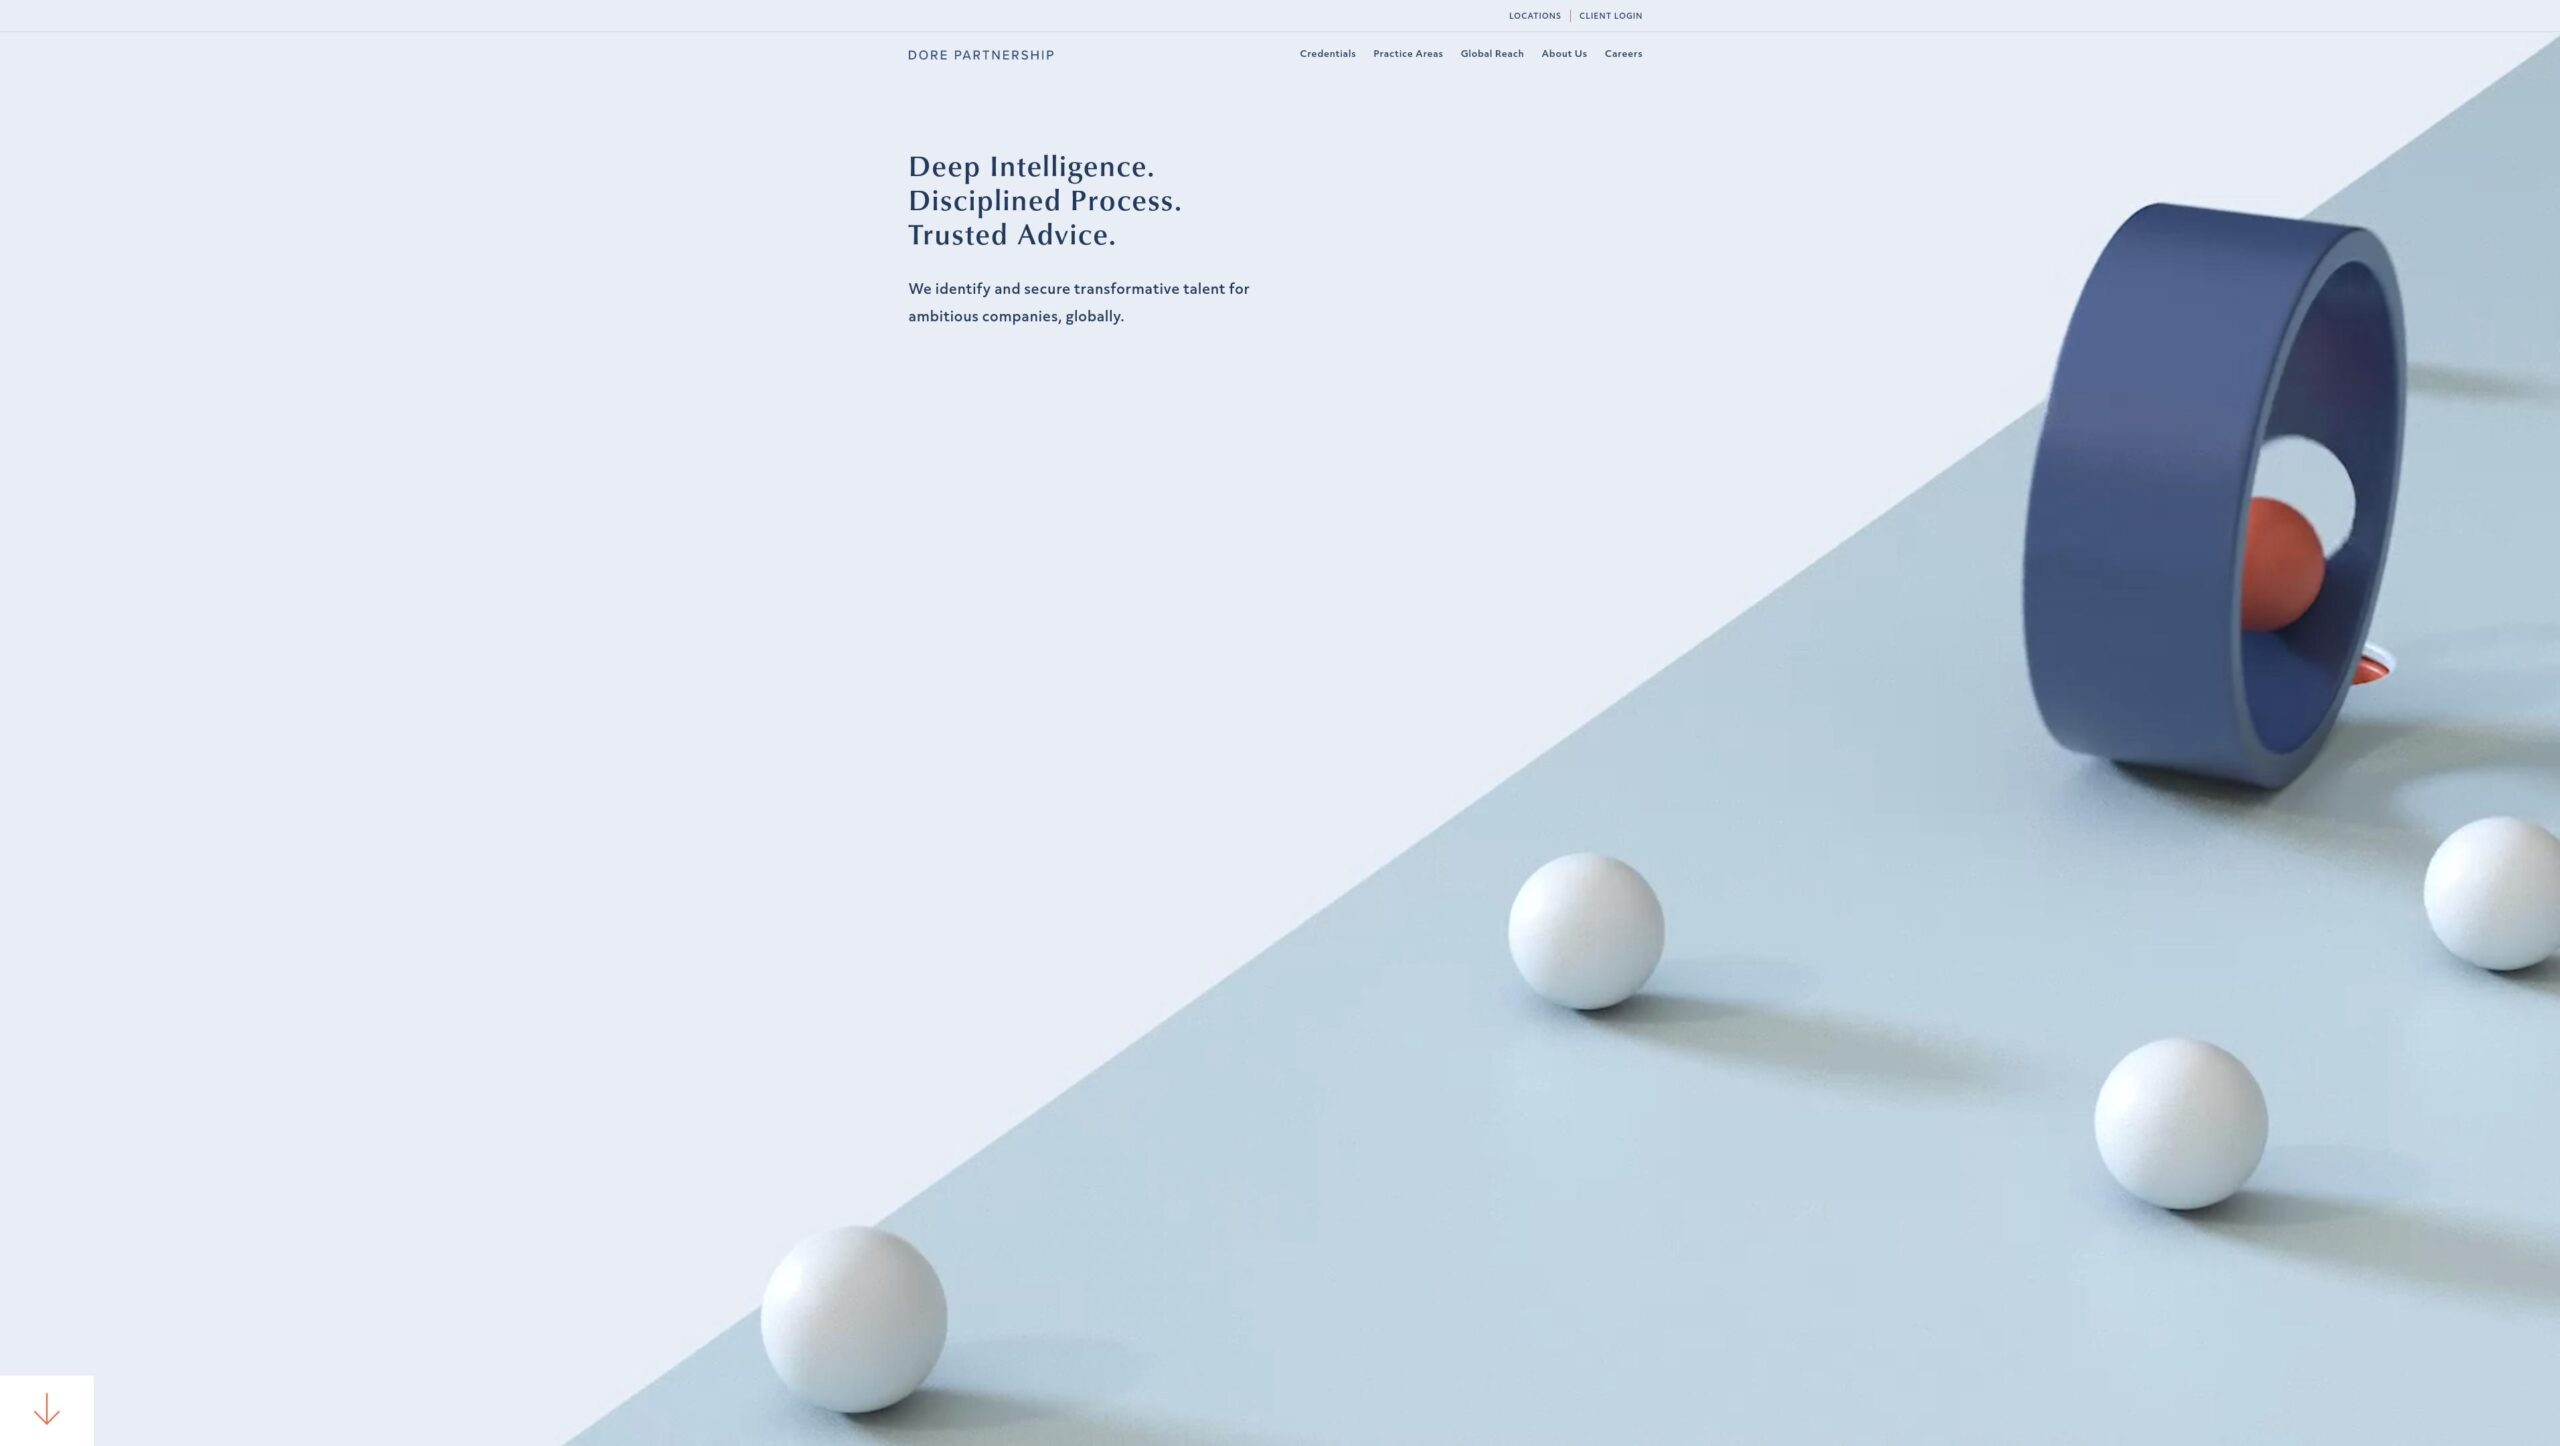 Orpetron Web Design Awards - Dore Partnership - Web Design Awards Inspiration Trends UI UX